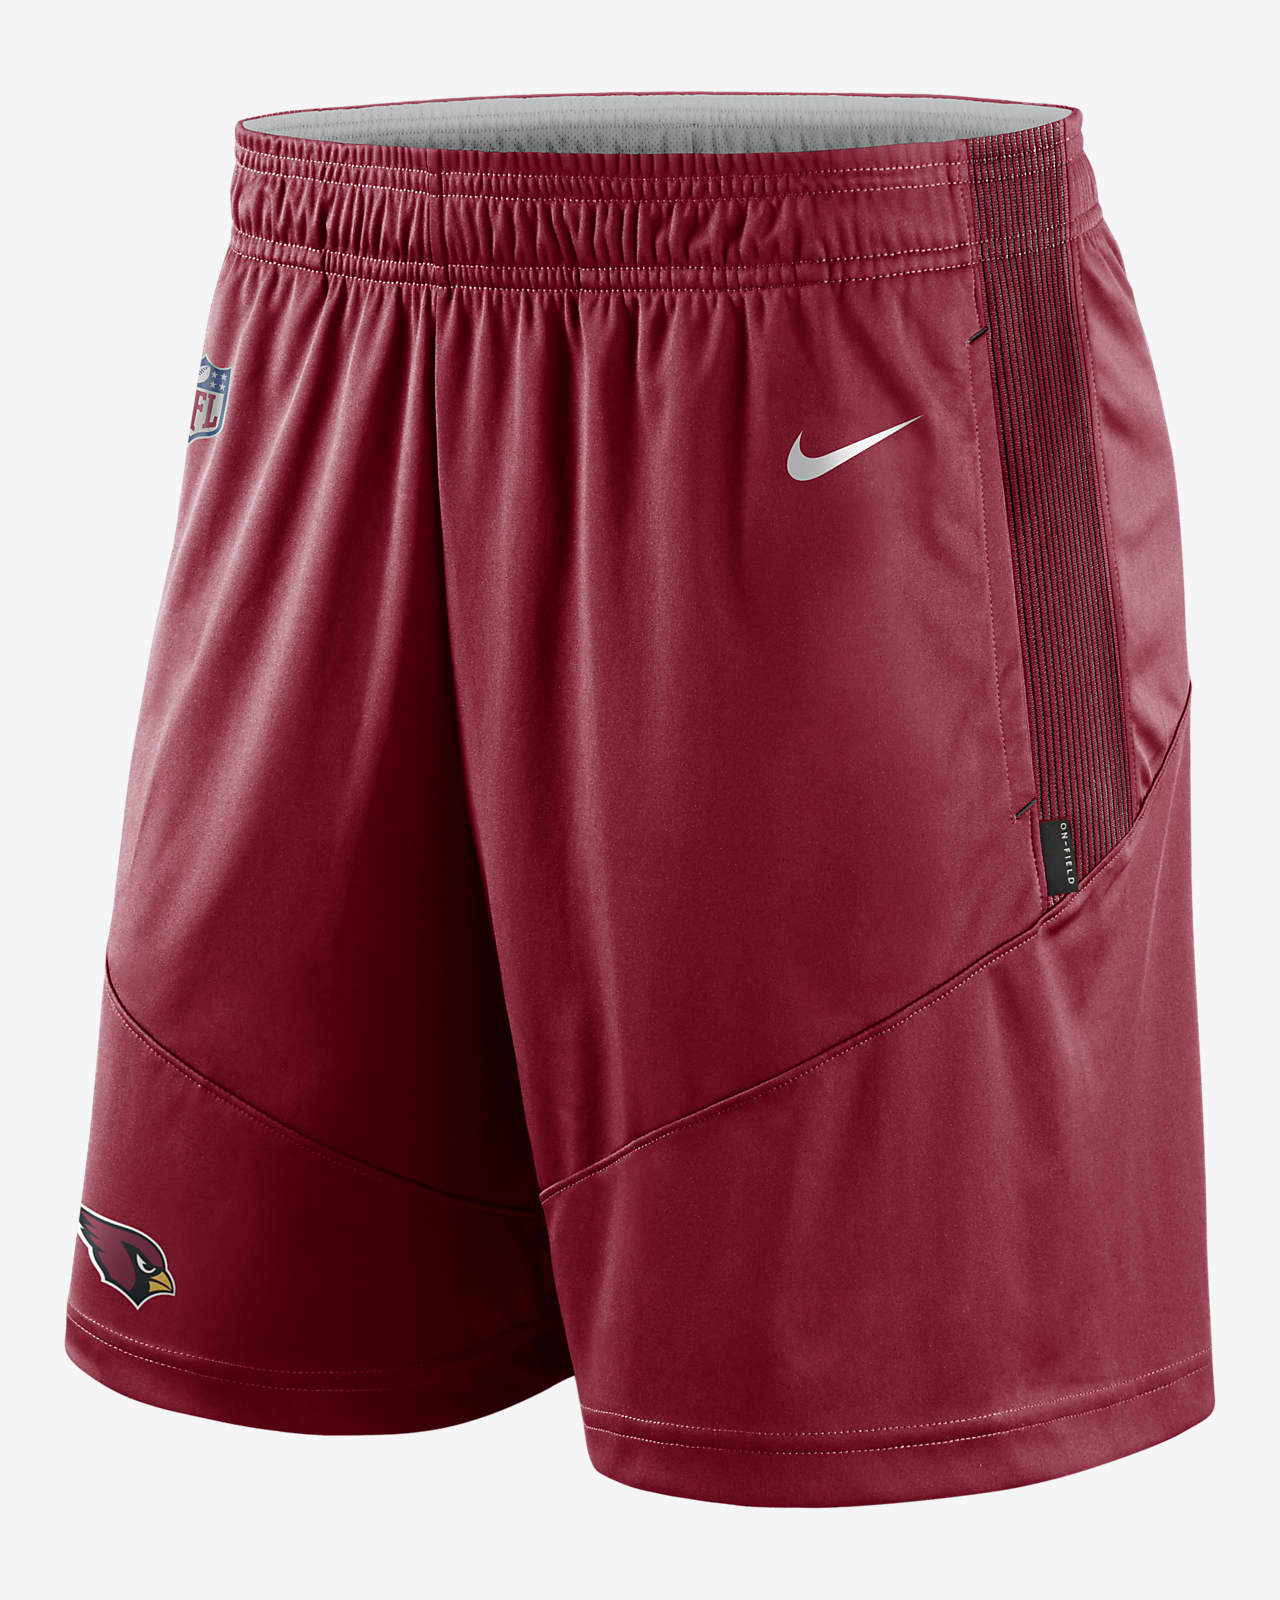 Nike Dri-FIT Sideline (NFL Arizona Cardinals) Men's Shorts